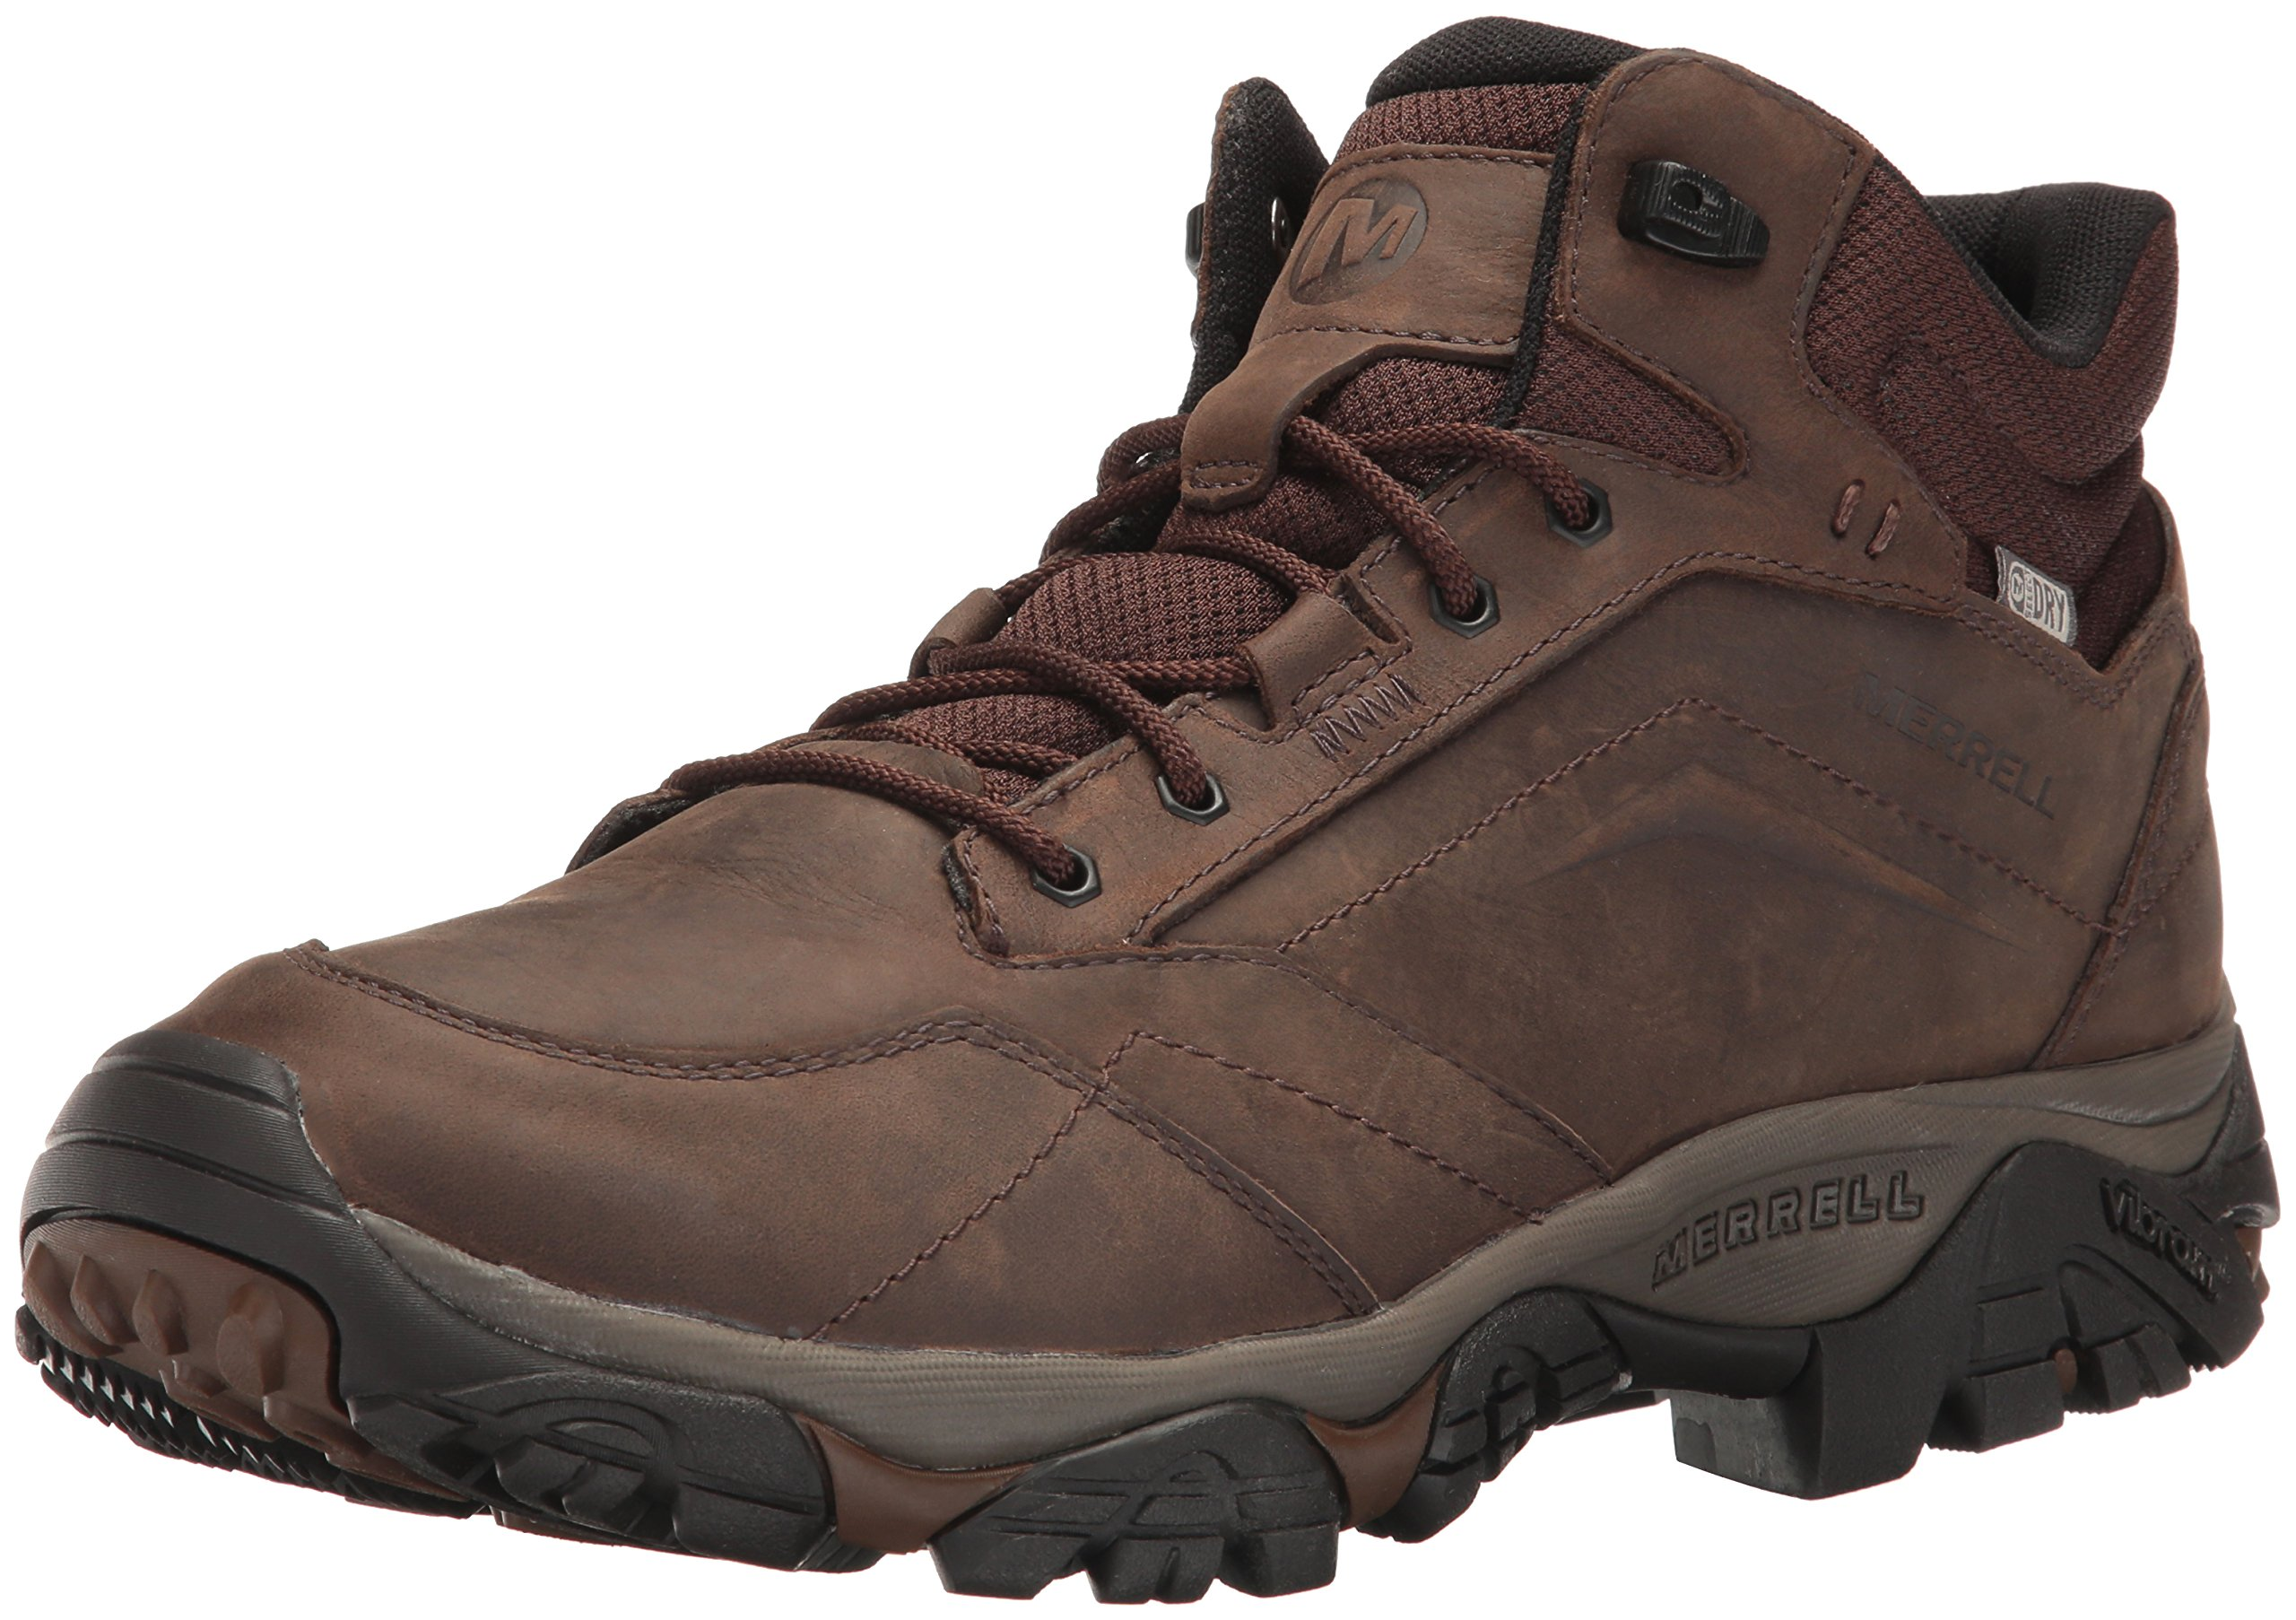 Merrell Men's Moab Adventure Mid Waterproof Hiking Boot, Dark Earth, 12 M US